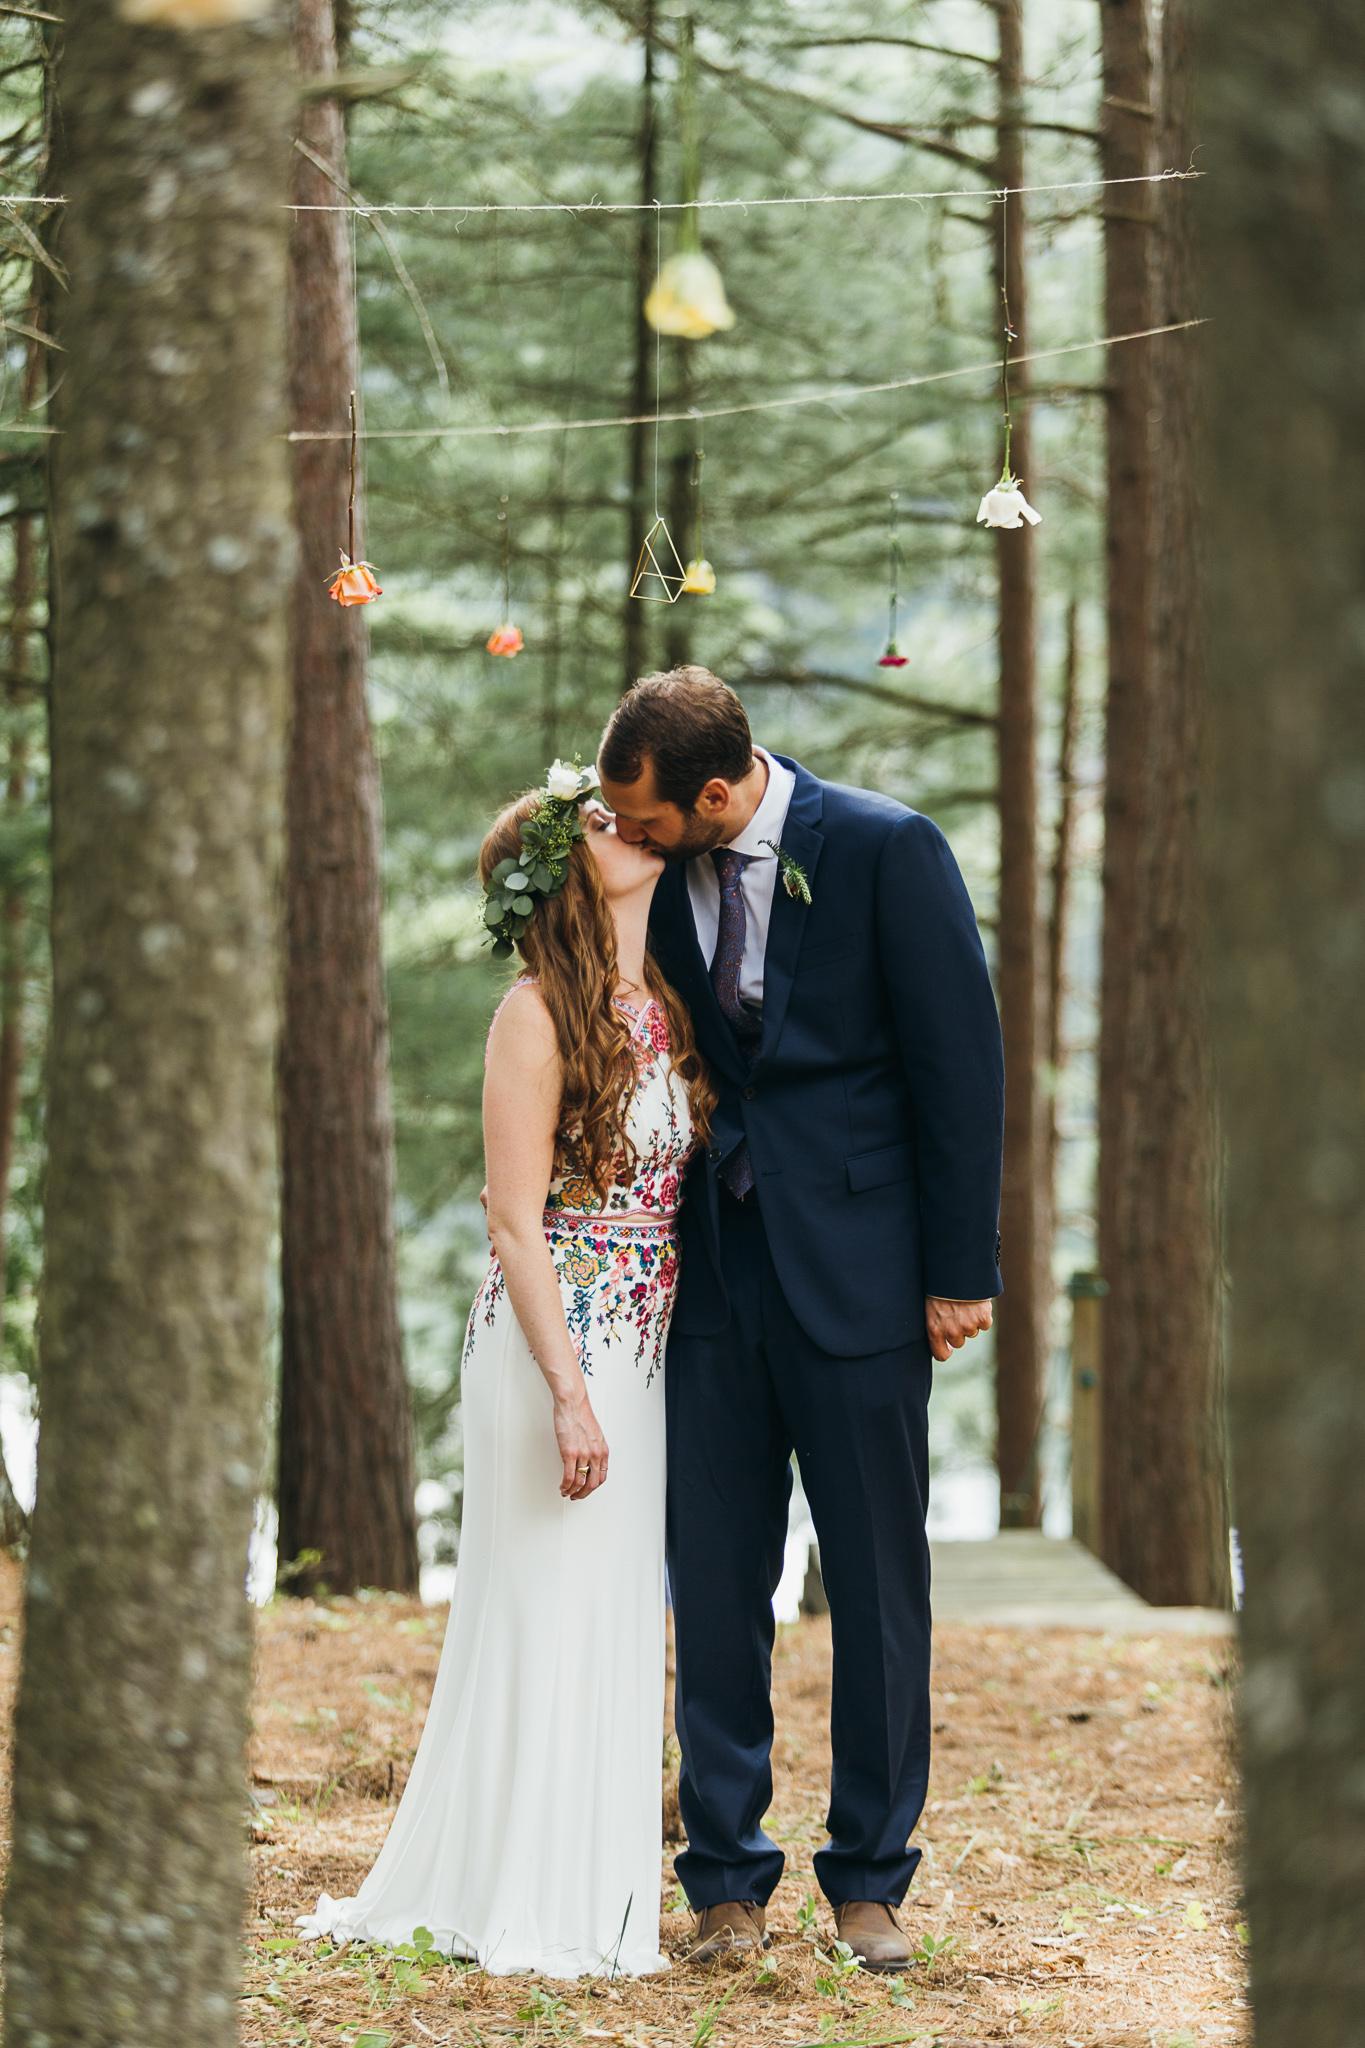 Intimate Backyard Wedding in Bancroft (97 of 143).jpg